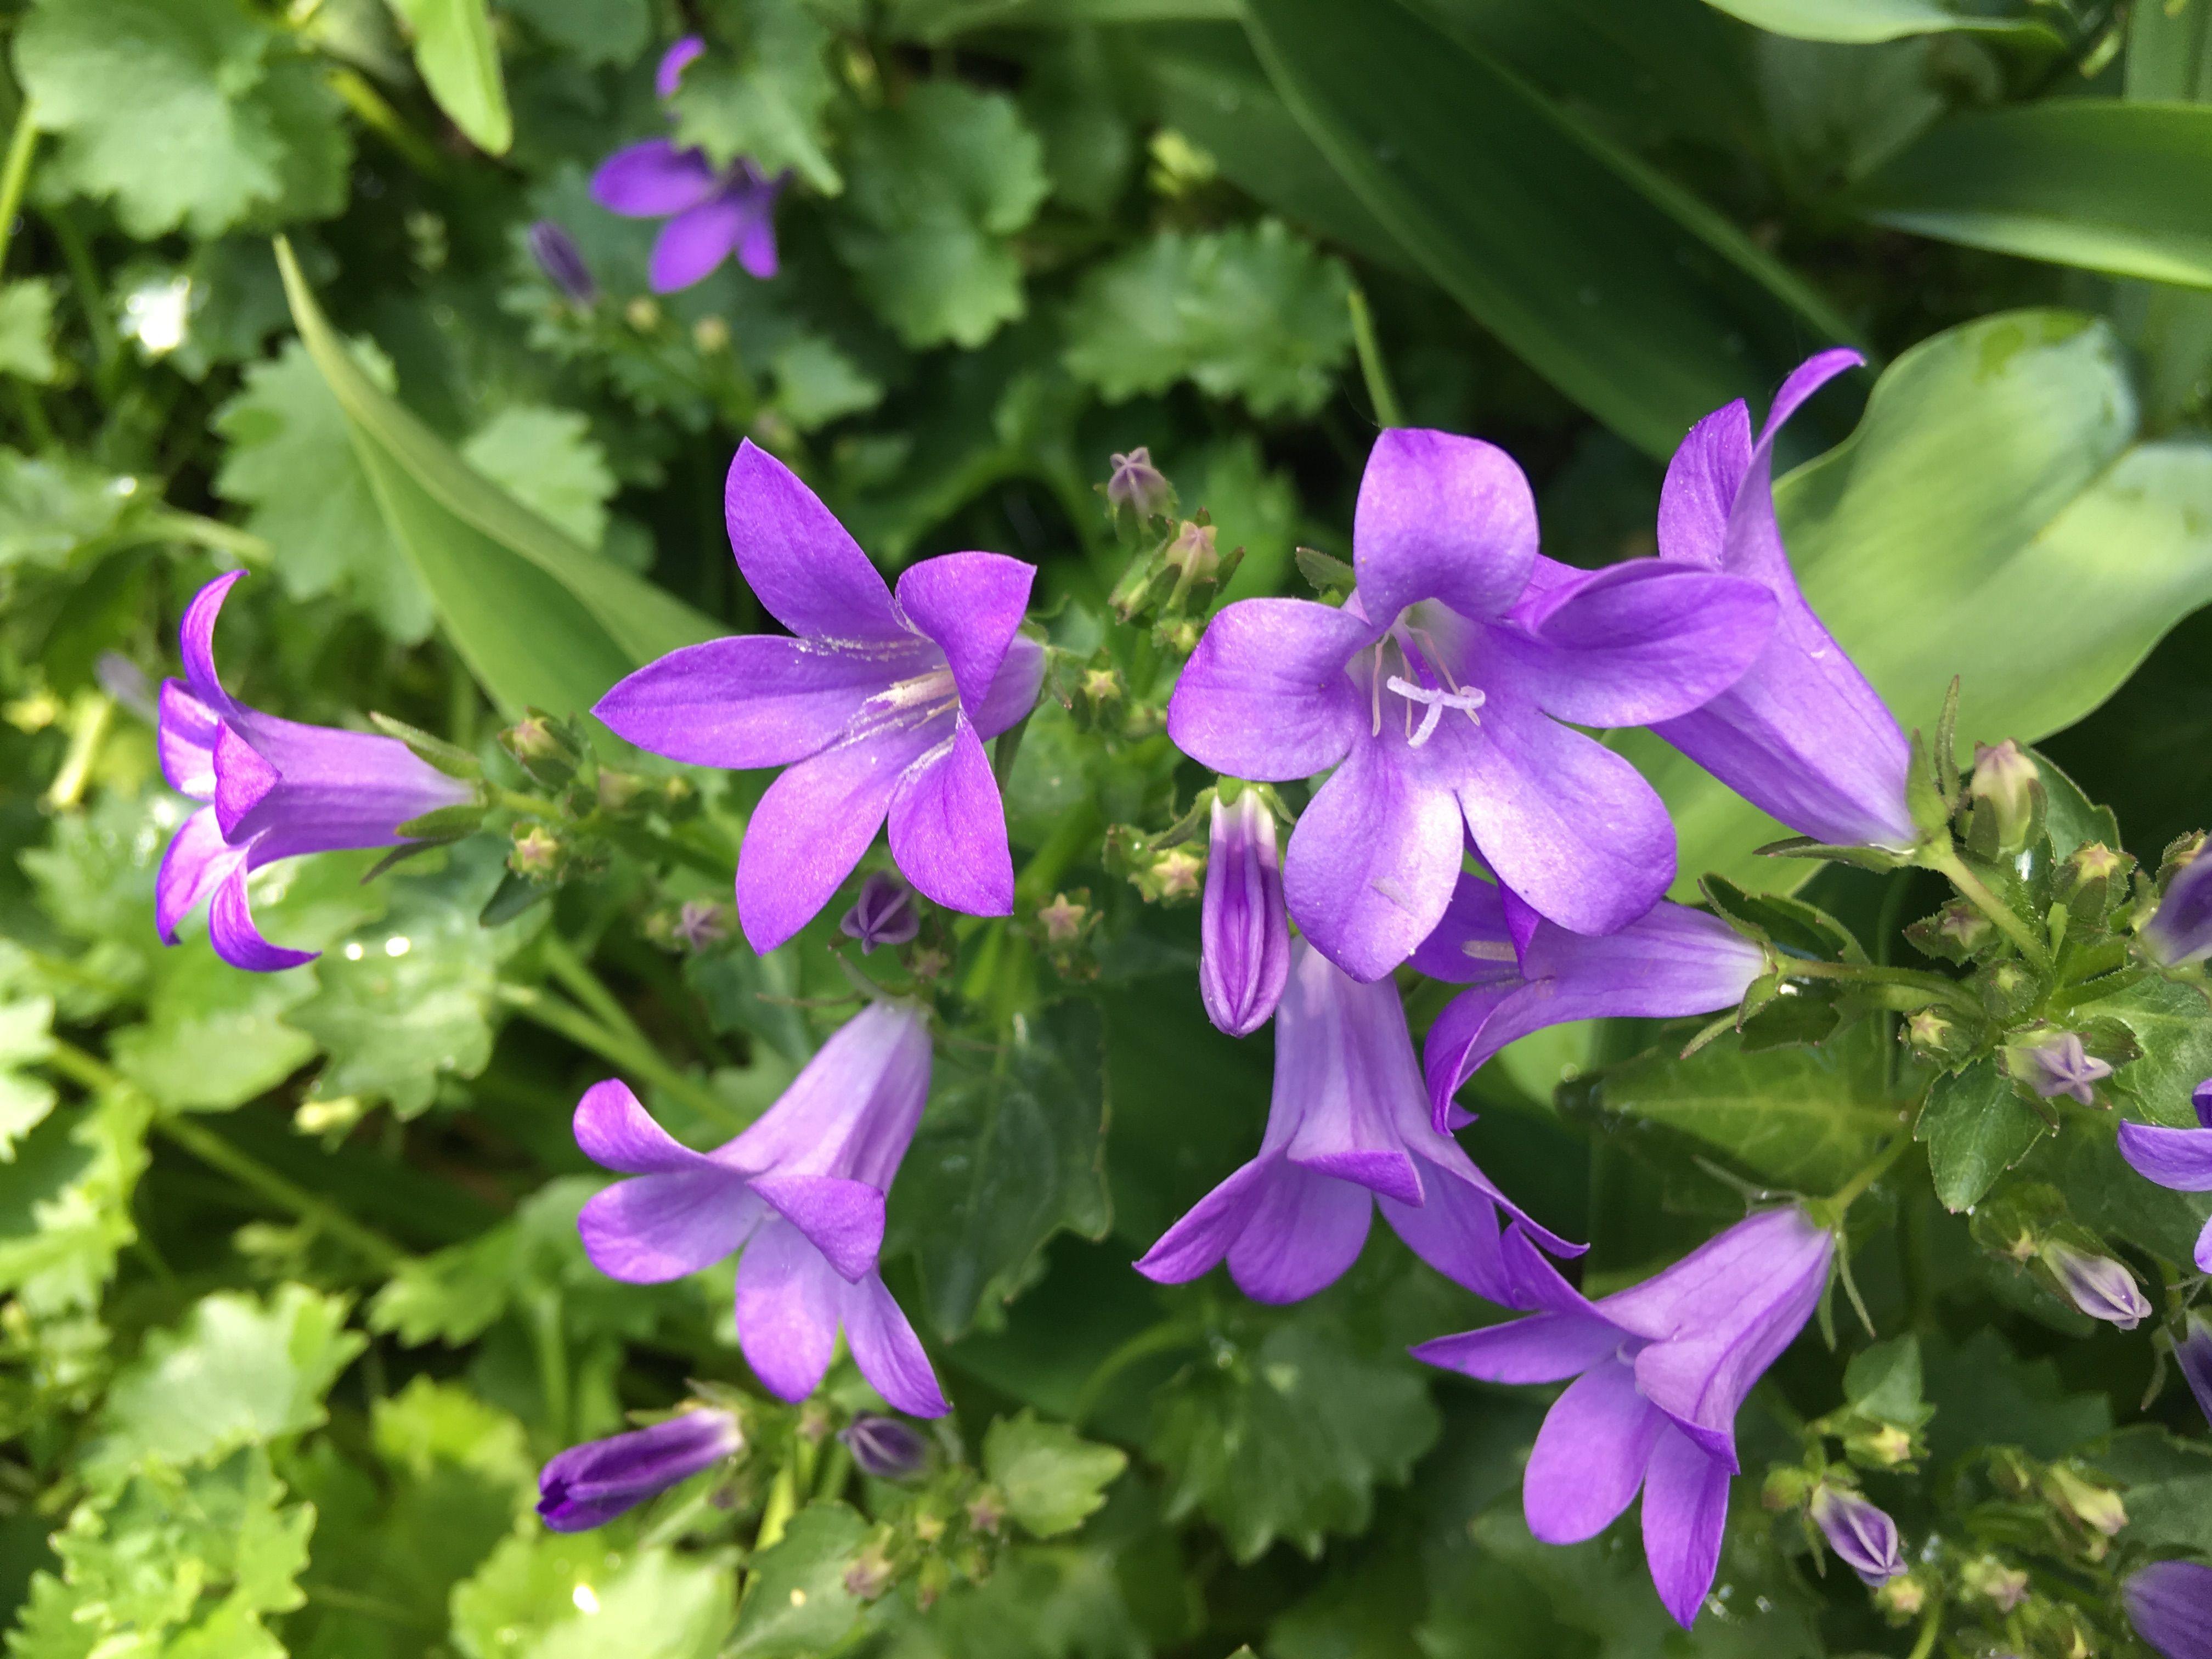 Campanula Or Bellflower Symbol Of Gratitude In The Language Of Flowers Language Of Flowers Flowers Bellflower